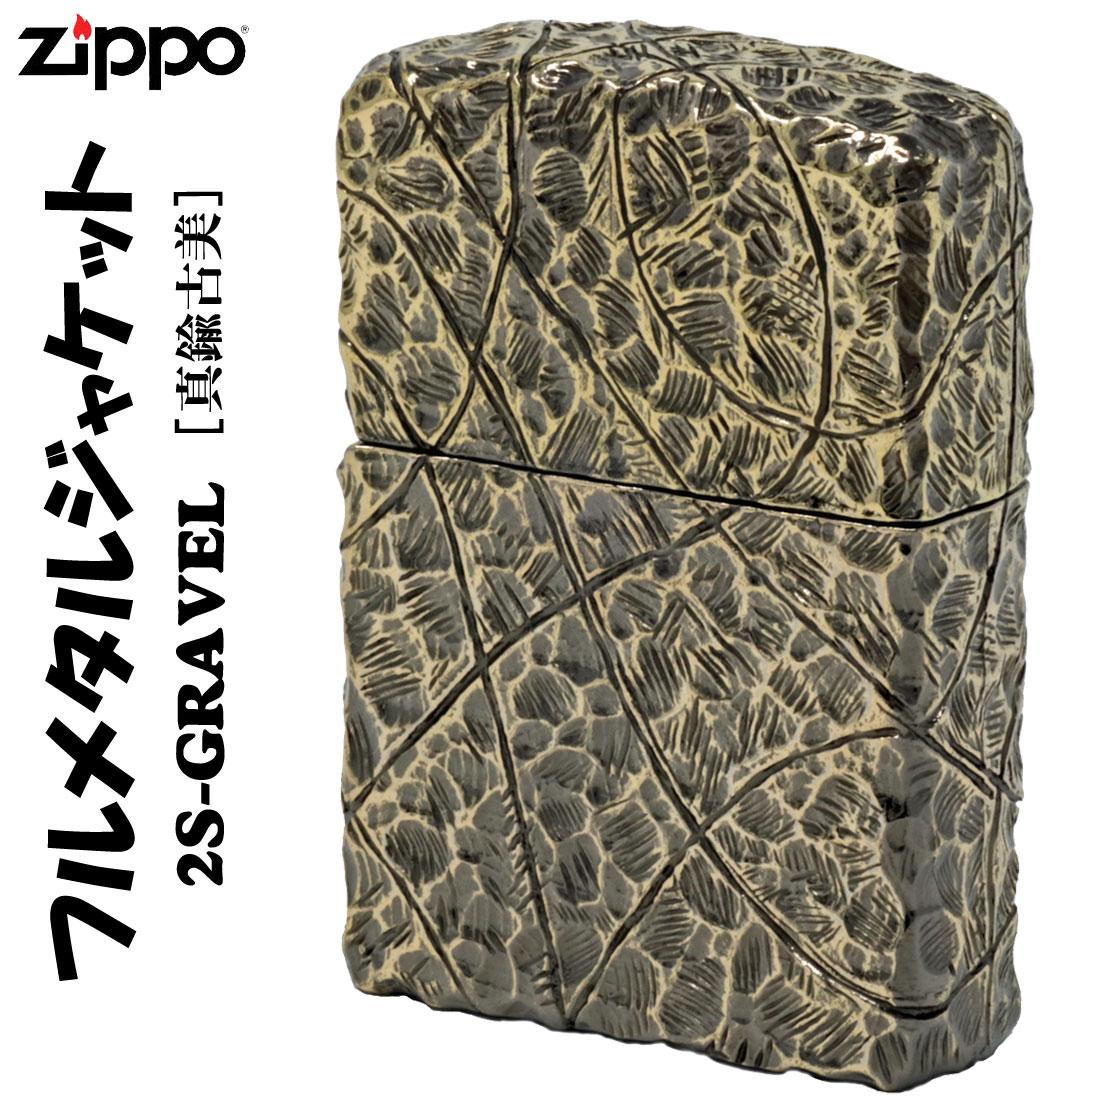 zippo フルメタルジャケット GRAVEL(砂利)模様 真鍮古美画像